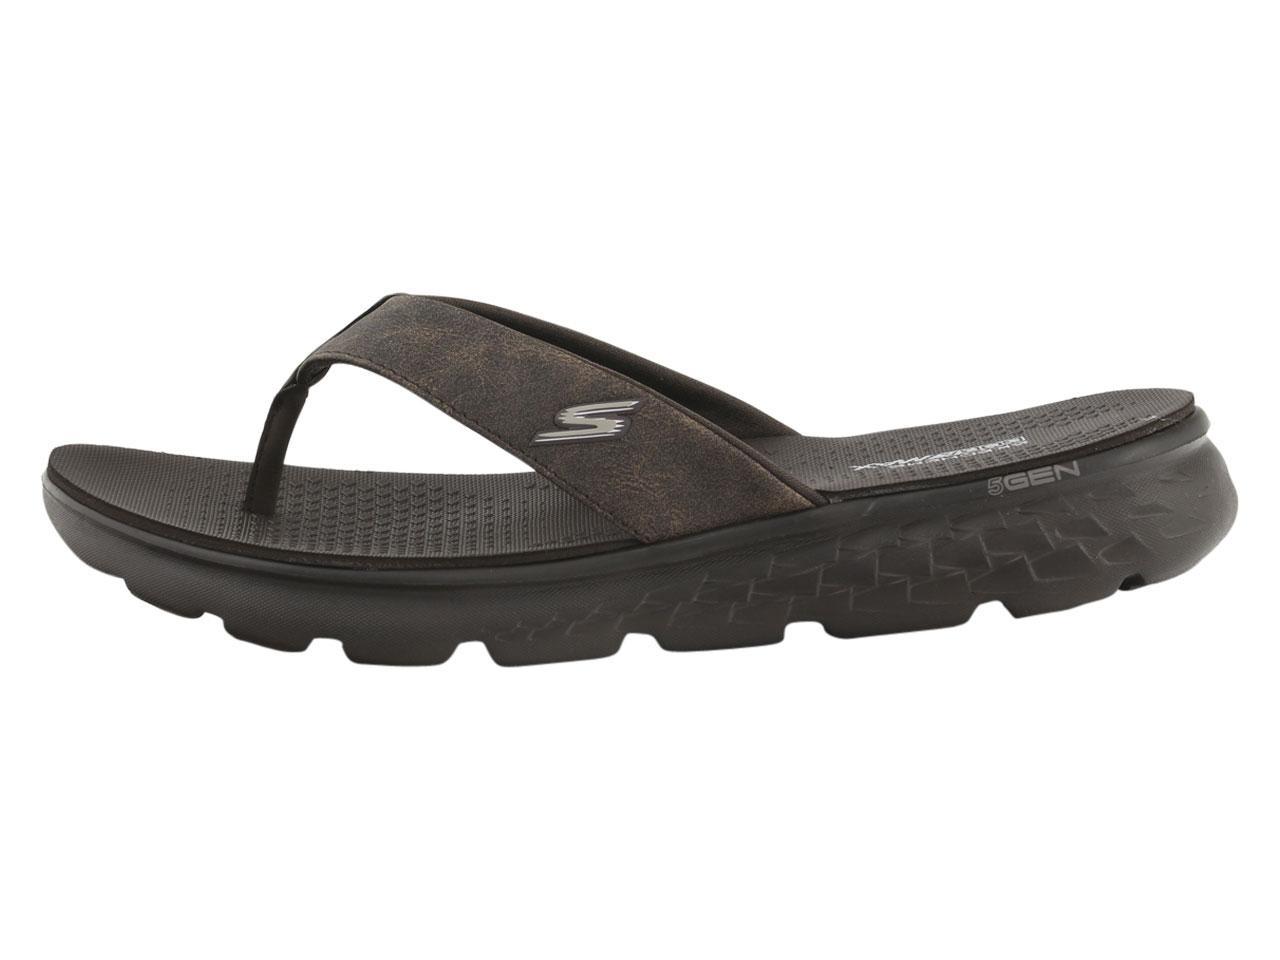 afa947468 Skechers Men s On-The-GO-400 Vista Flip Flops Sandals Shoes by Skechers.  1234567